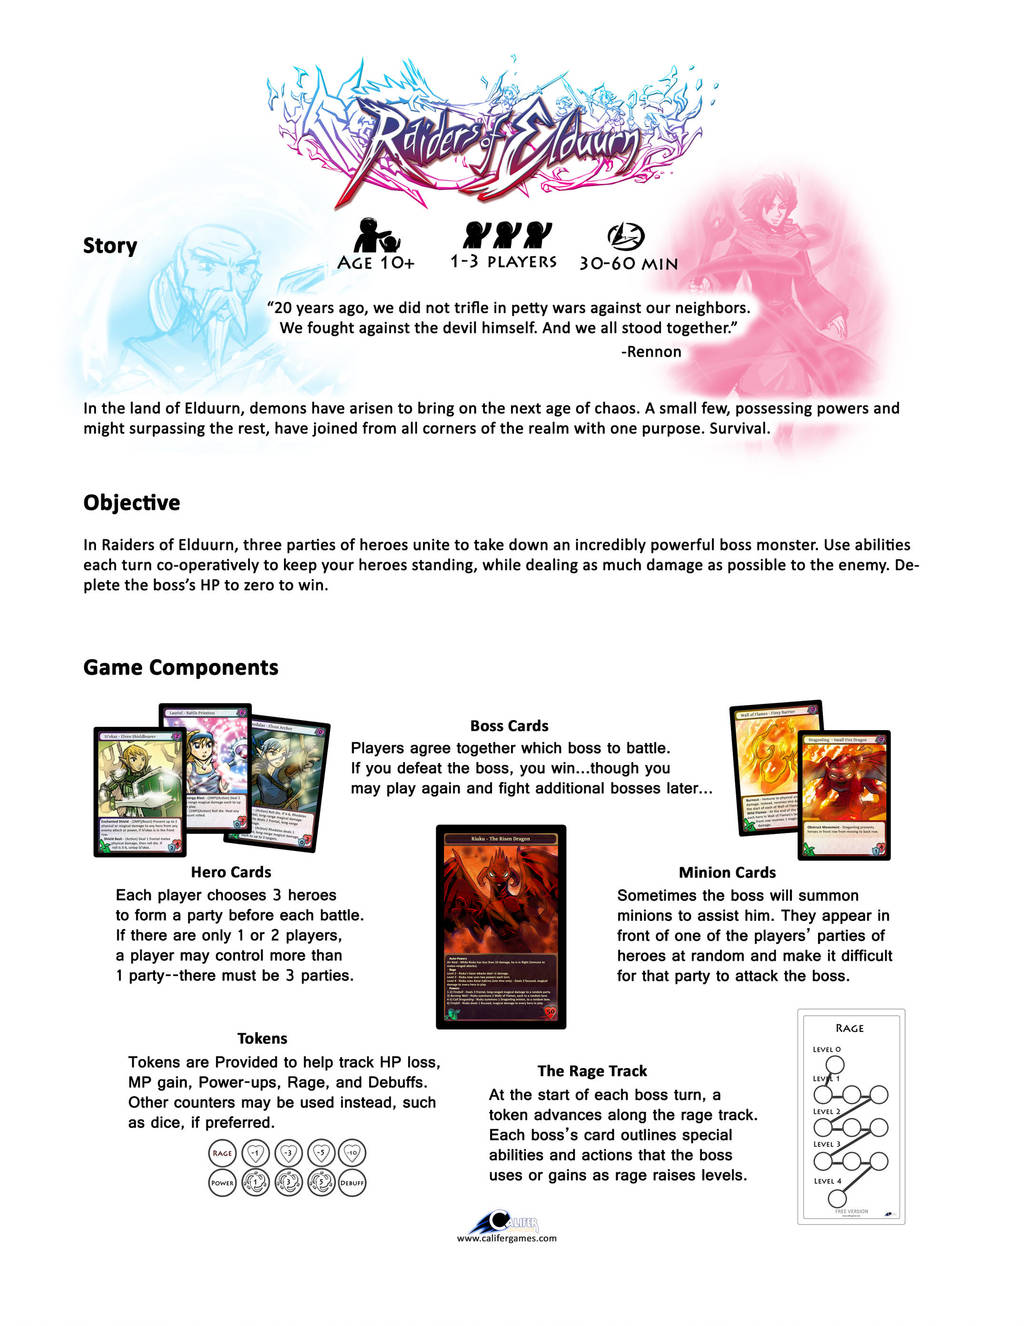 Raiders of Elduurn - Instructions page1 by Peter-CaliferGames